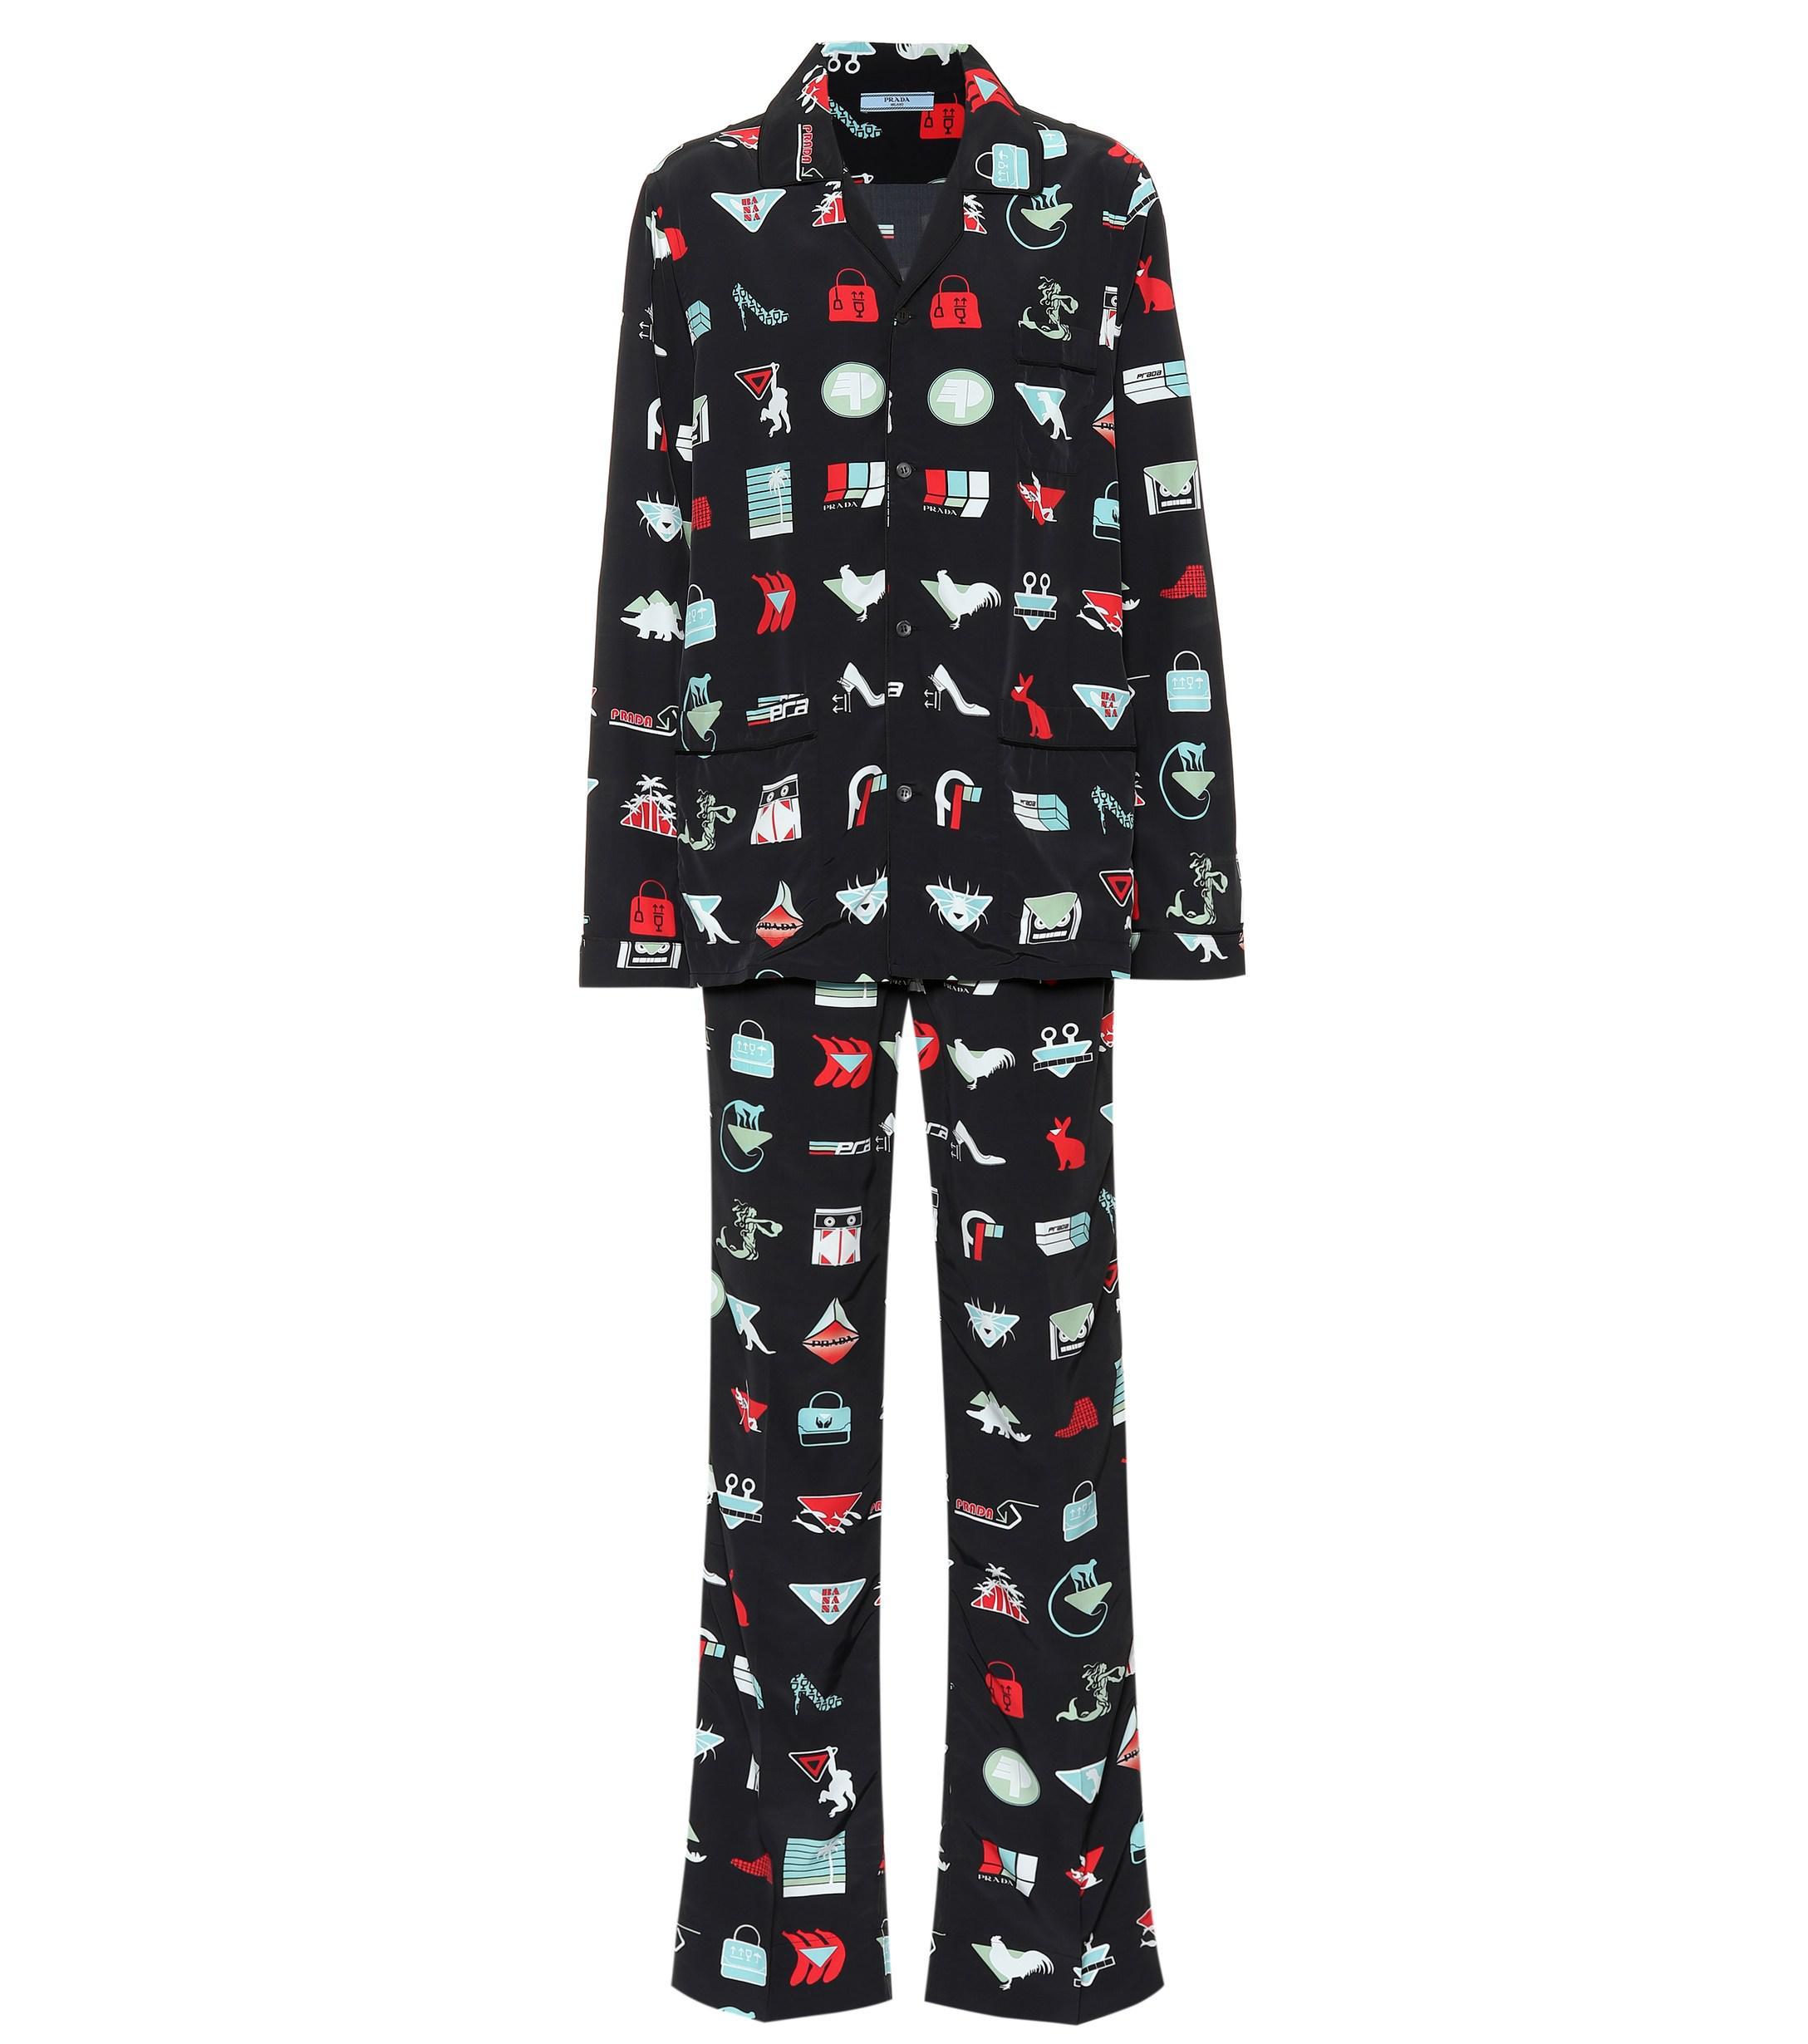 Nero Perla Brown Cotton Pajama Set